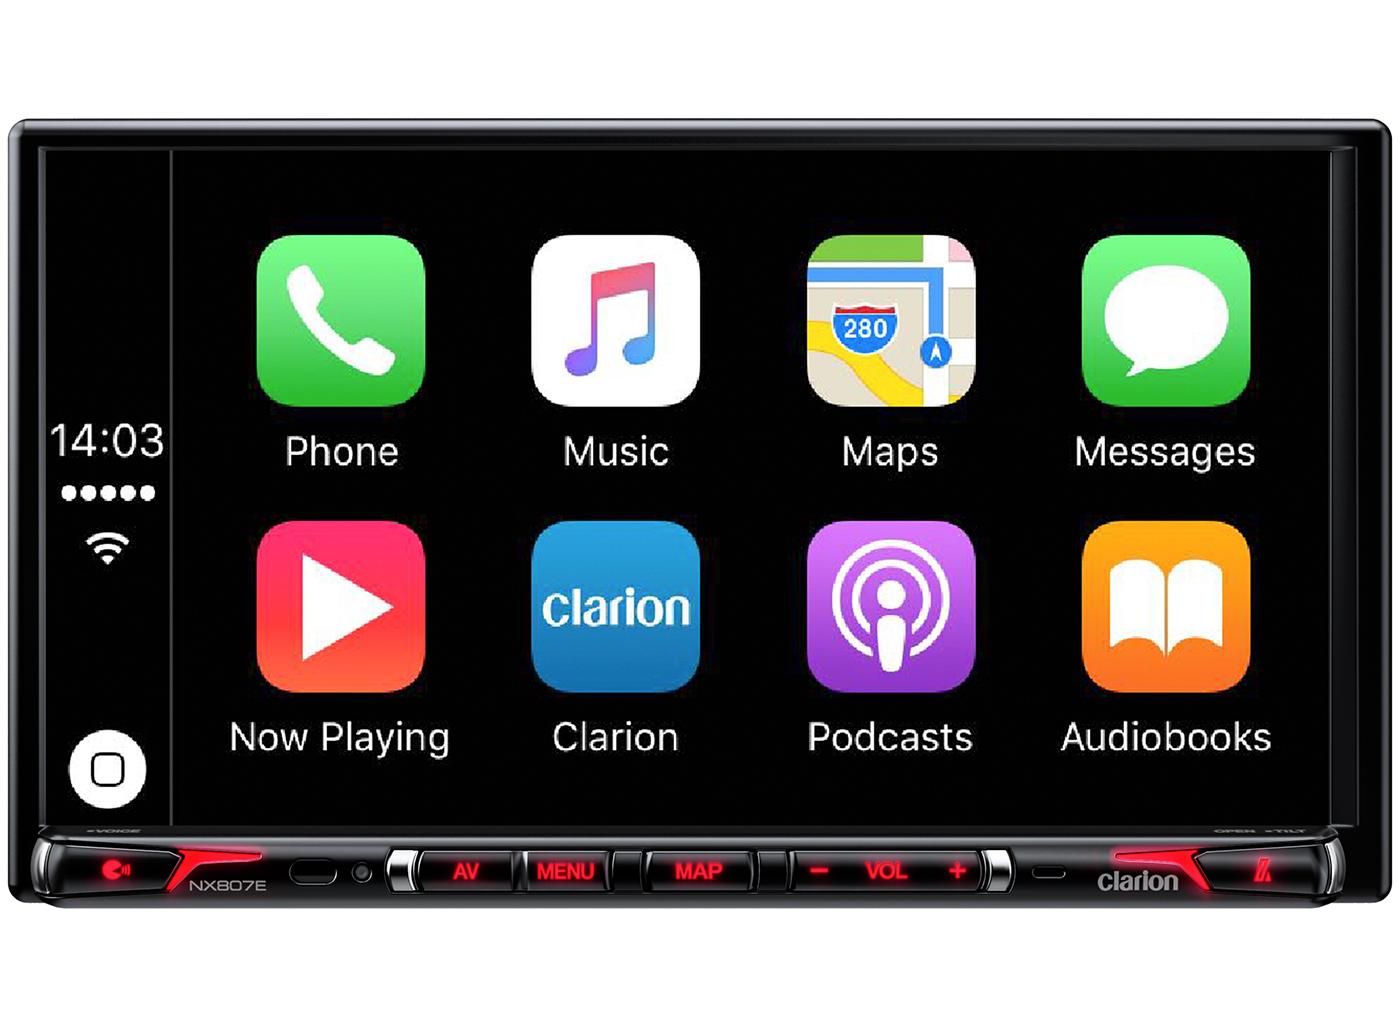 Clarion ΝΧ807Ε: Ένα νέο σύστημα πολυμέσων με CarPlay ! Apple CarPlay, Clarion, navigation, Αξεσουάρ, Ηχοσύστημα αυτοκινήτου, Τεχνολογία